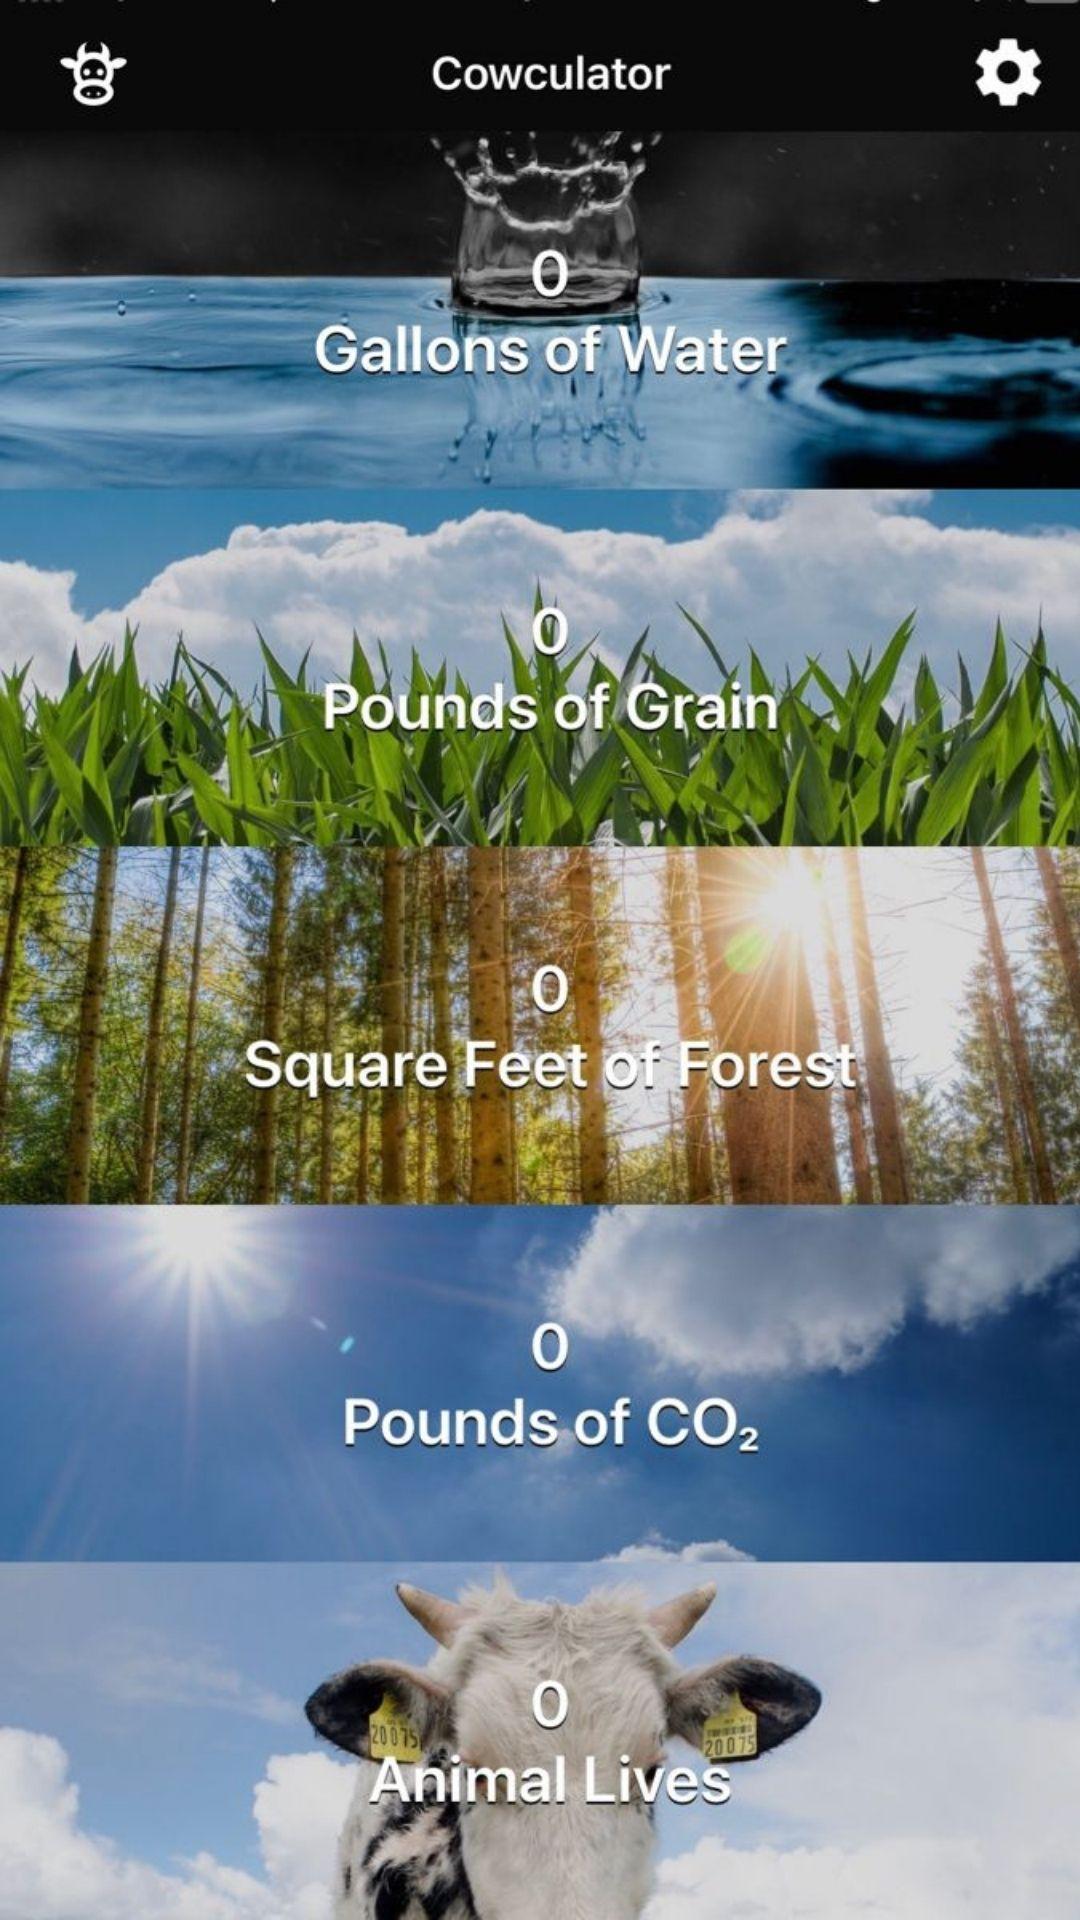 Cowculator app